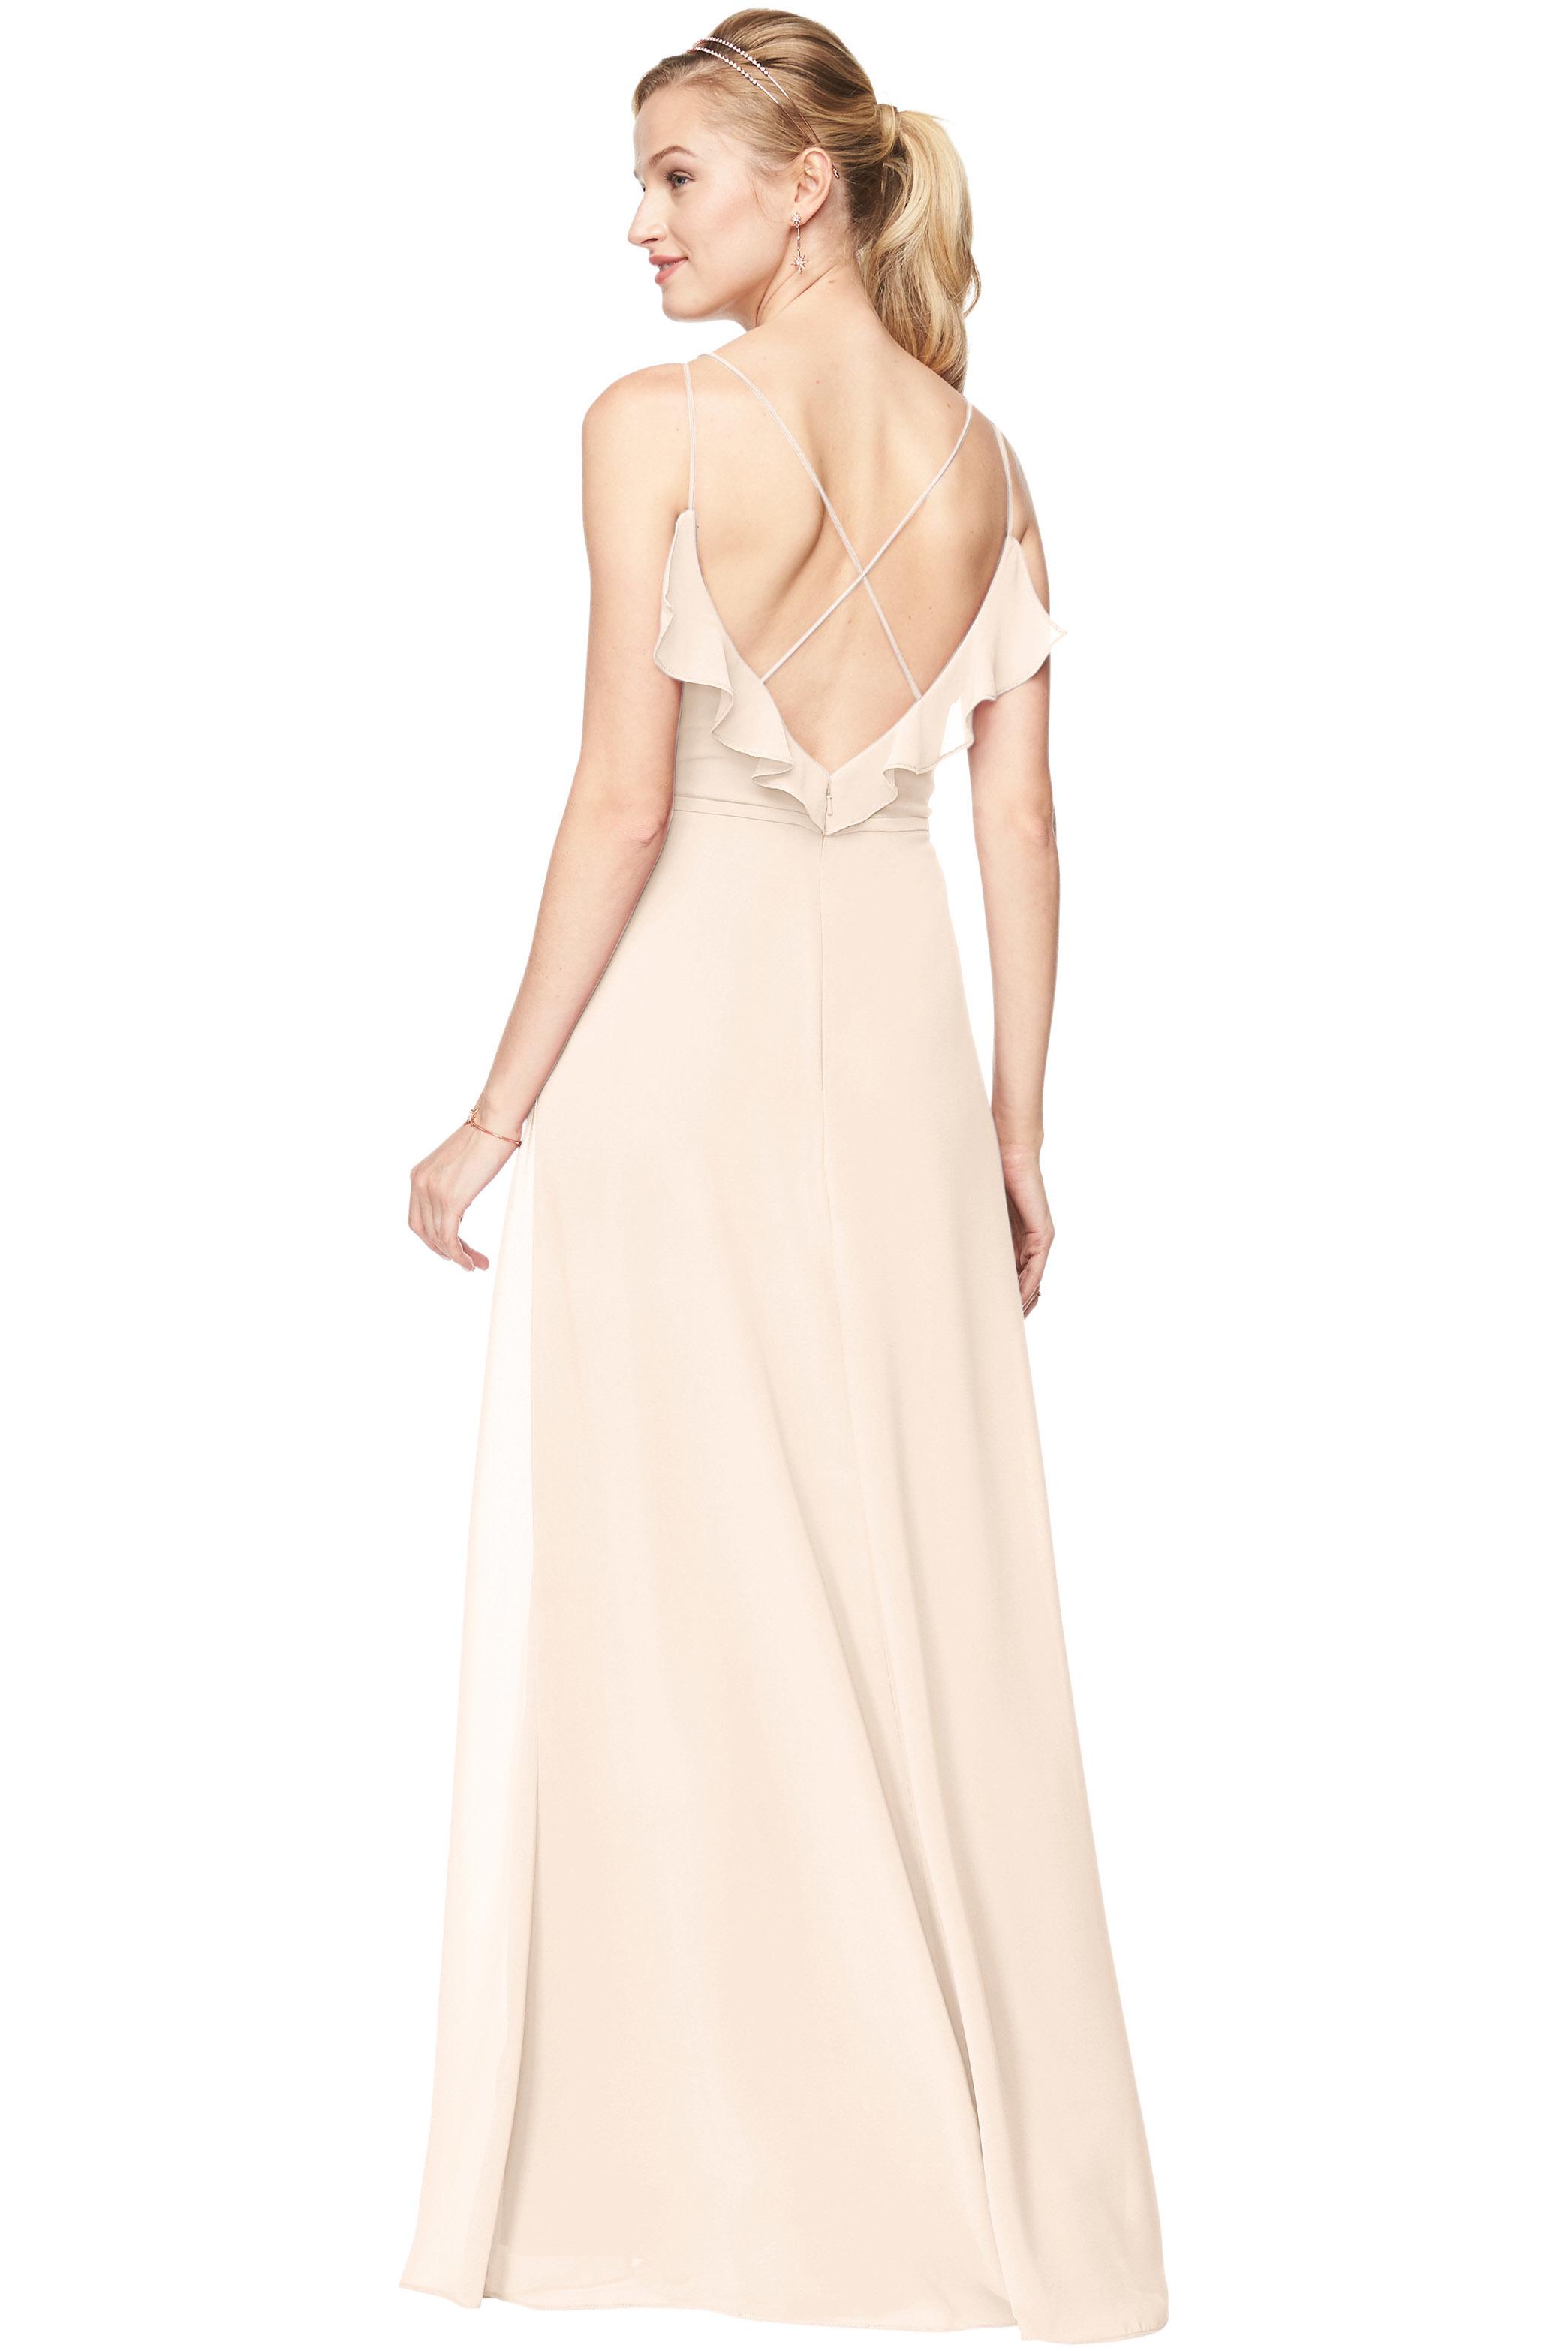 Bill Levkoff IVORY Chiffon V-Neck A-line gown, $198.00 Back